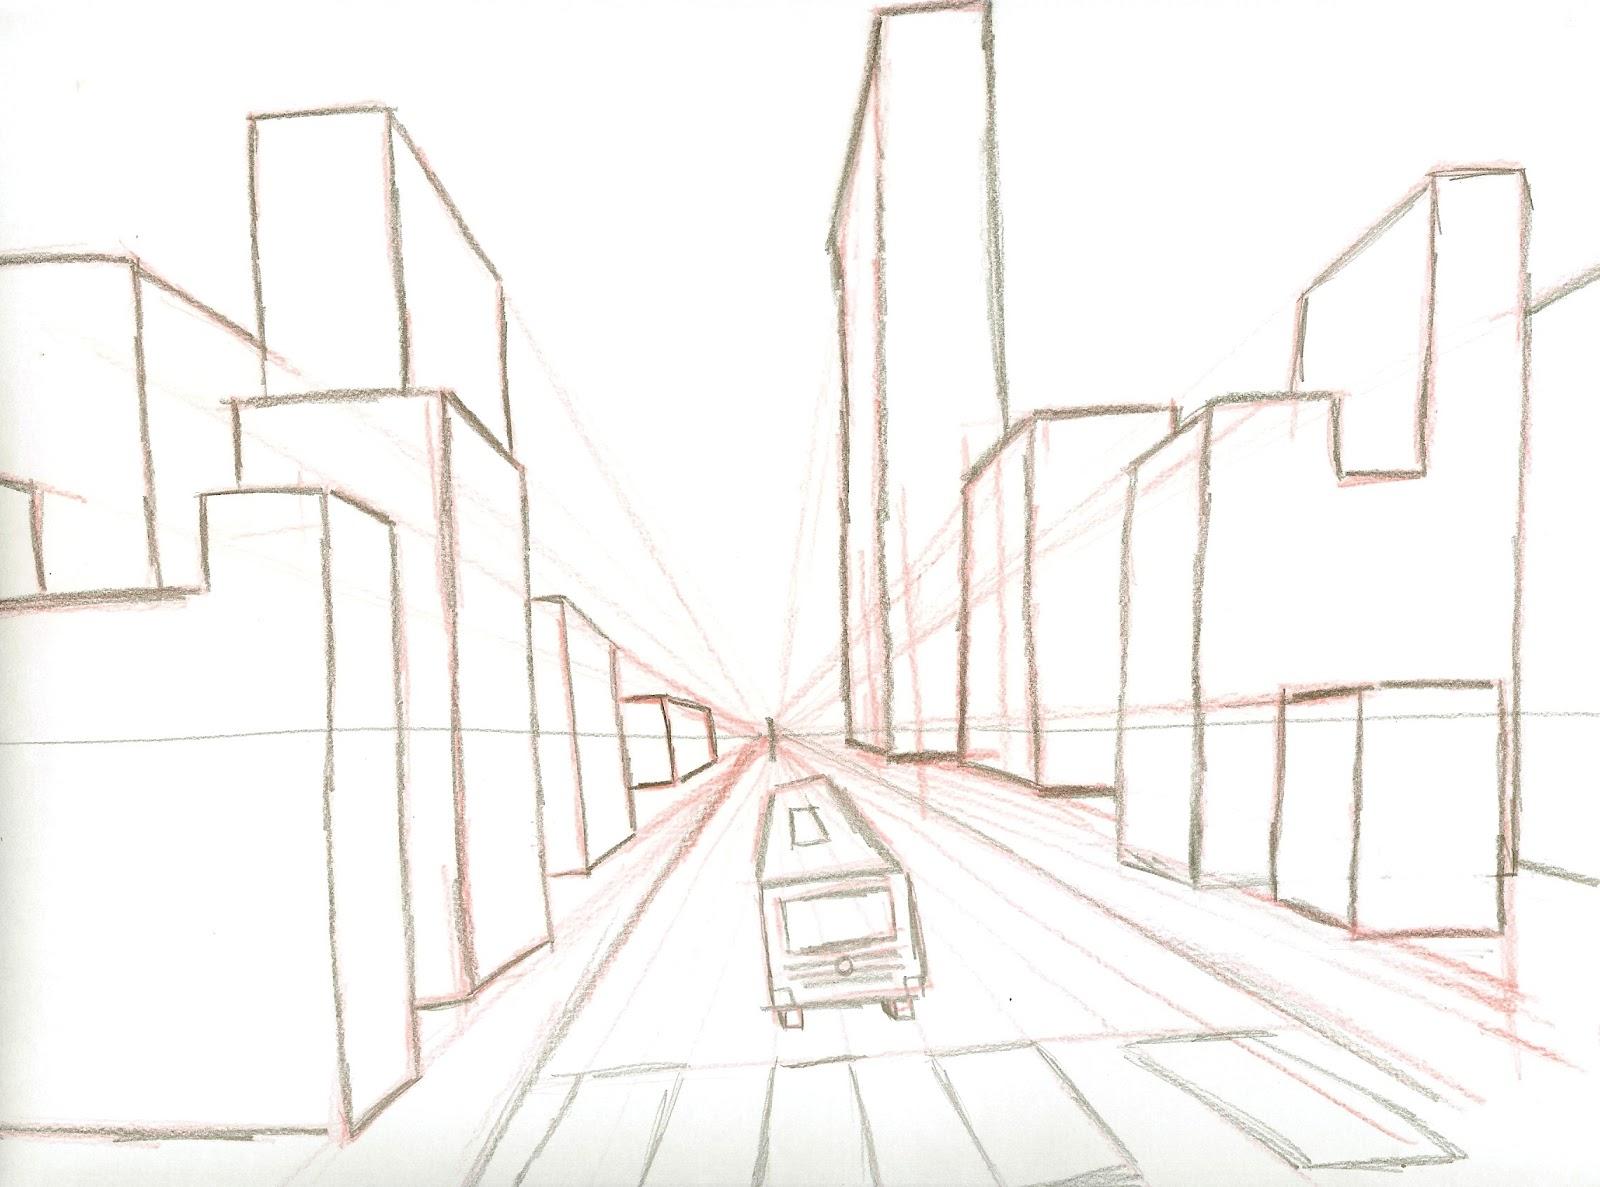 PDD Profesor de Dibujo - YouTube